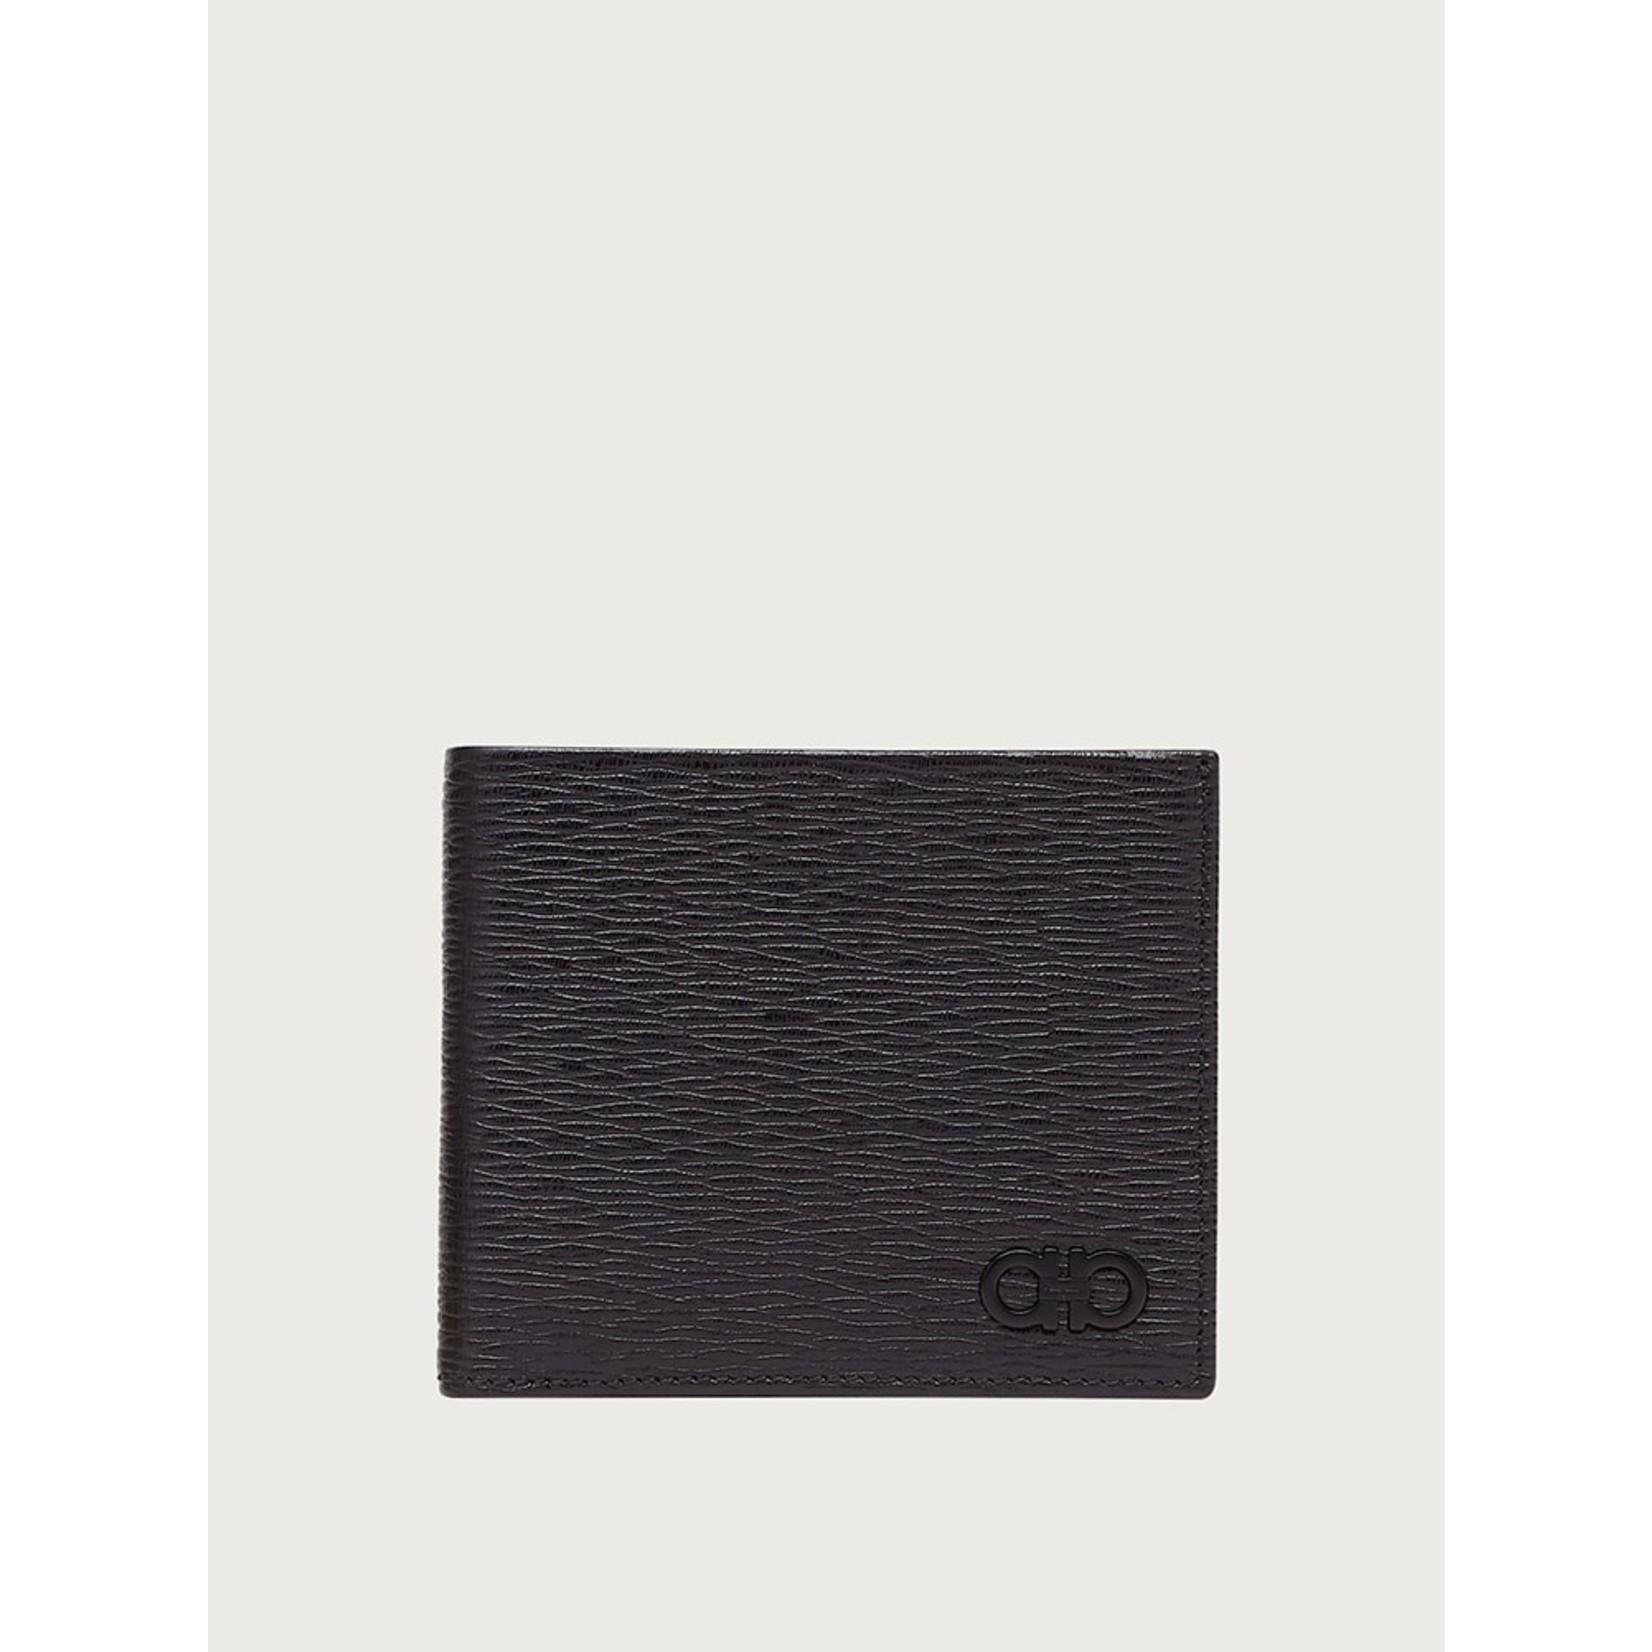 SALVATORE FERRAGAMO SALVATORE FERRAGAMO - CARD HOLDER REVIVAL 733308